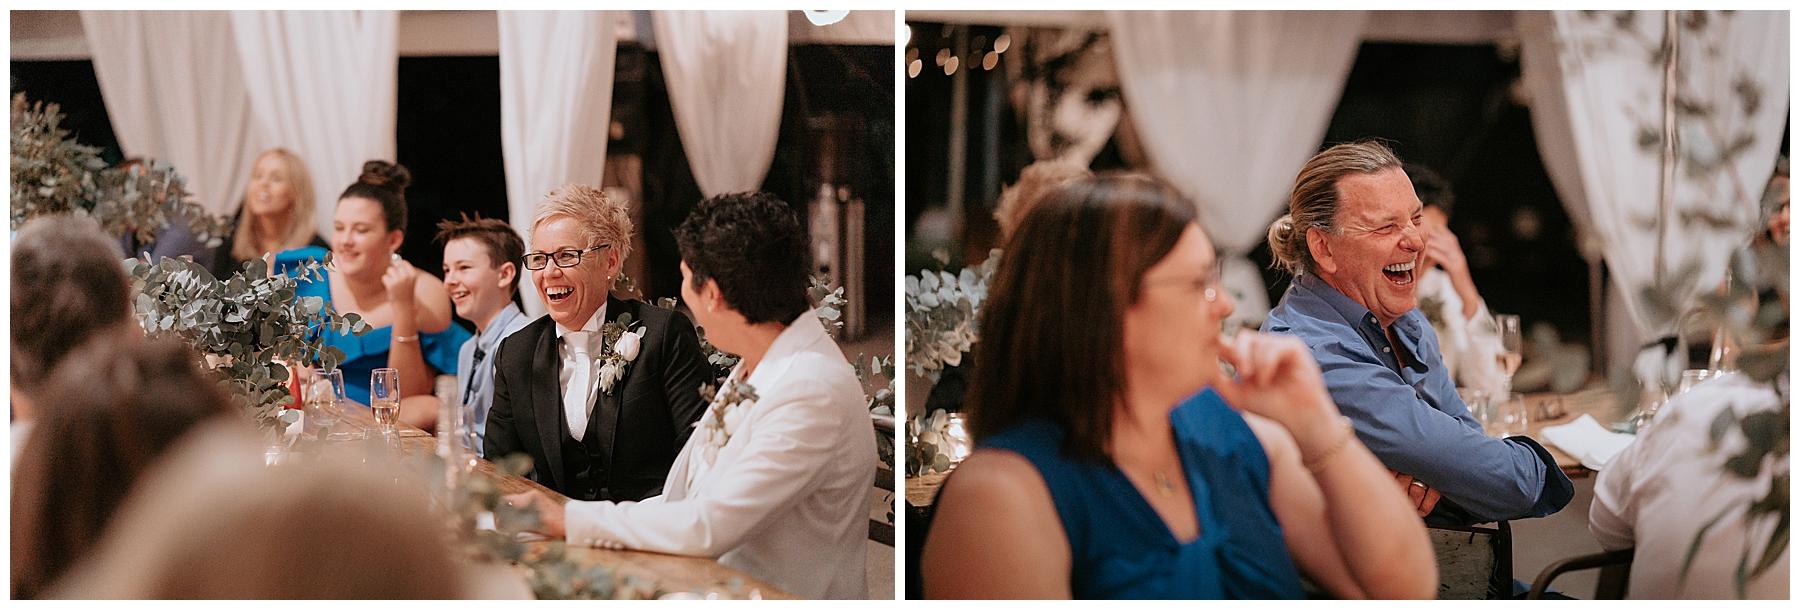 Wallalong House same sex wedding popcorn photography_0039.jpg